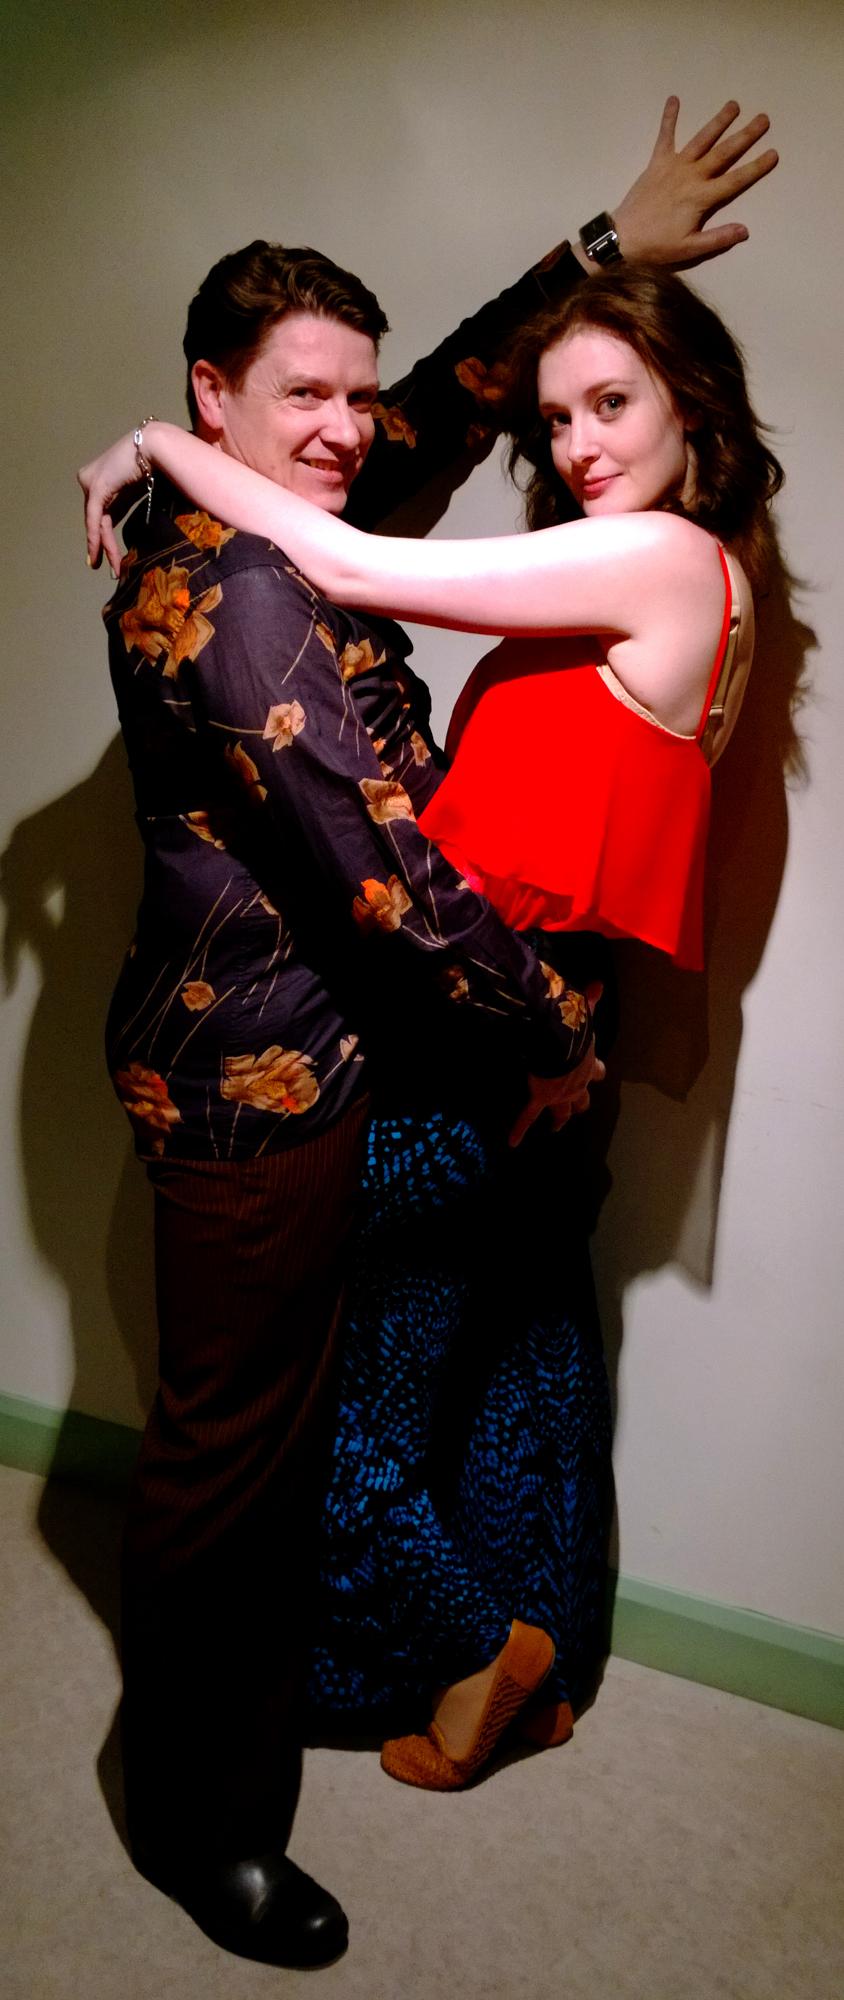 Kenneth Pinkerton is Spencer and Josephine Heinemeier is Lorraine - the Boogie Nights Club singers